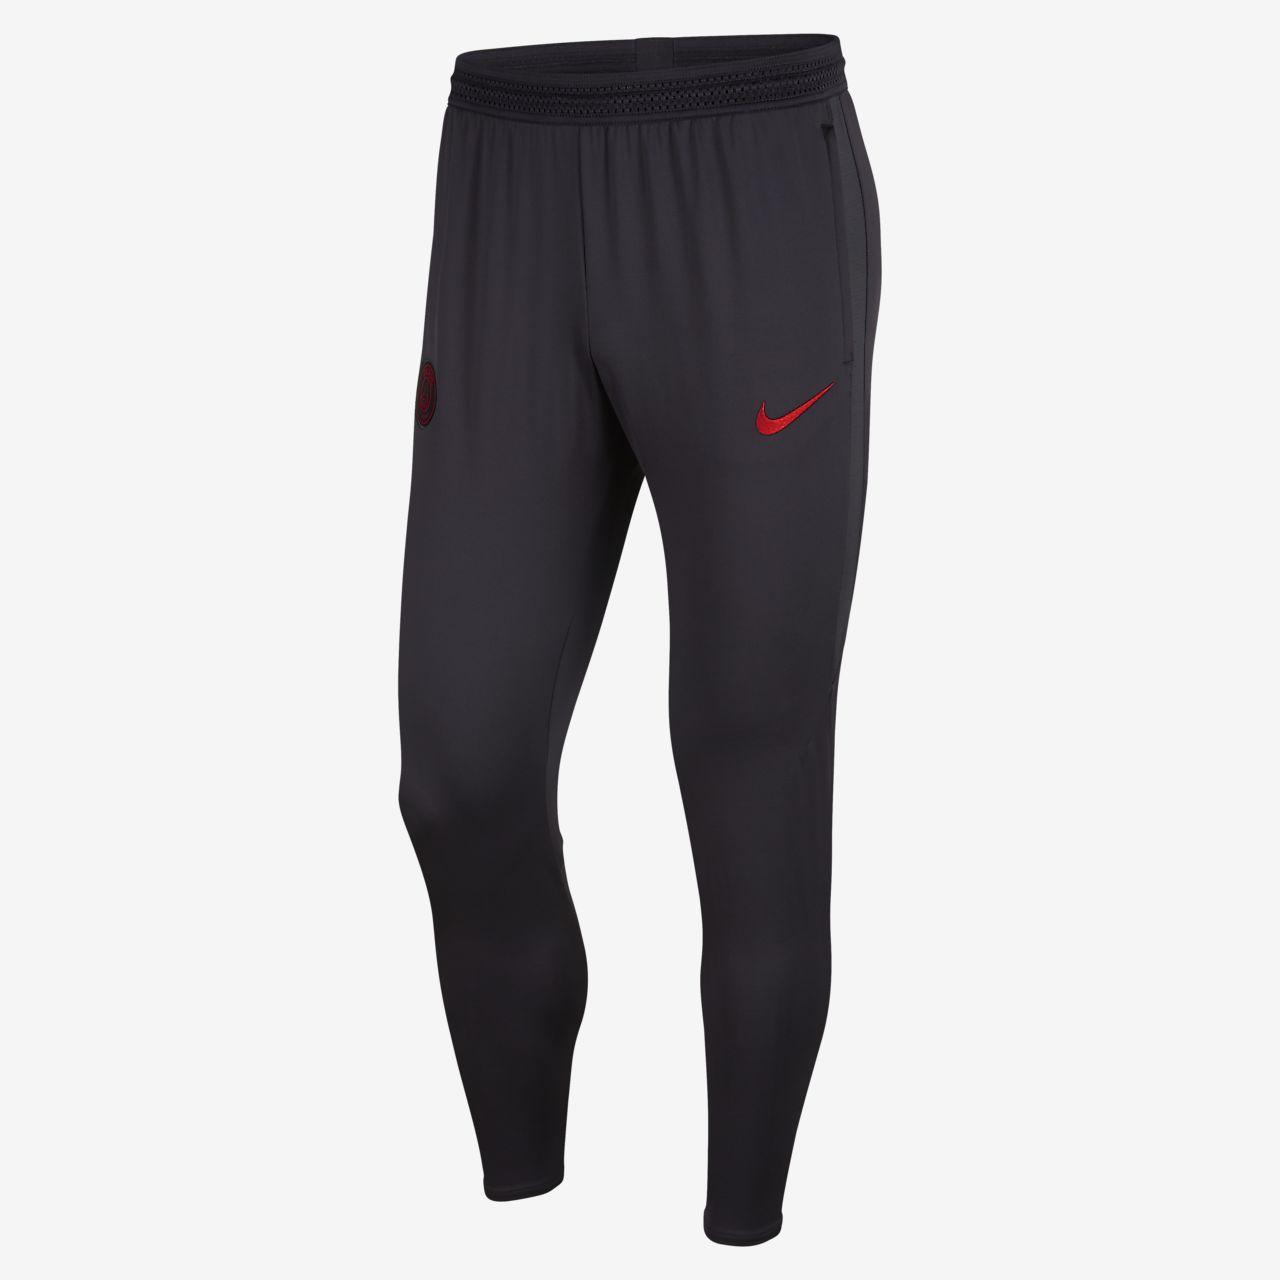 Pantalones de fútbol para hombre Nike Dri-FIT Paris Saint-Germain Strike